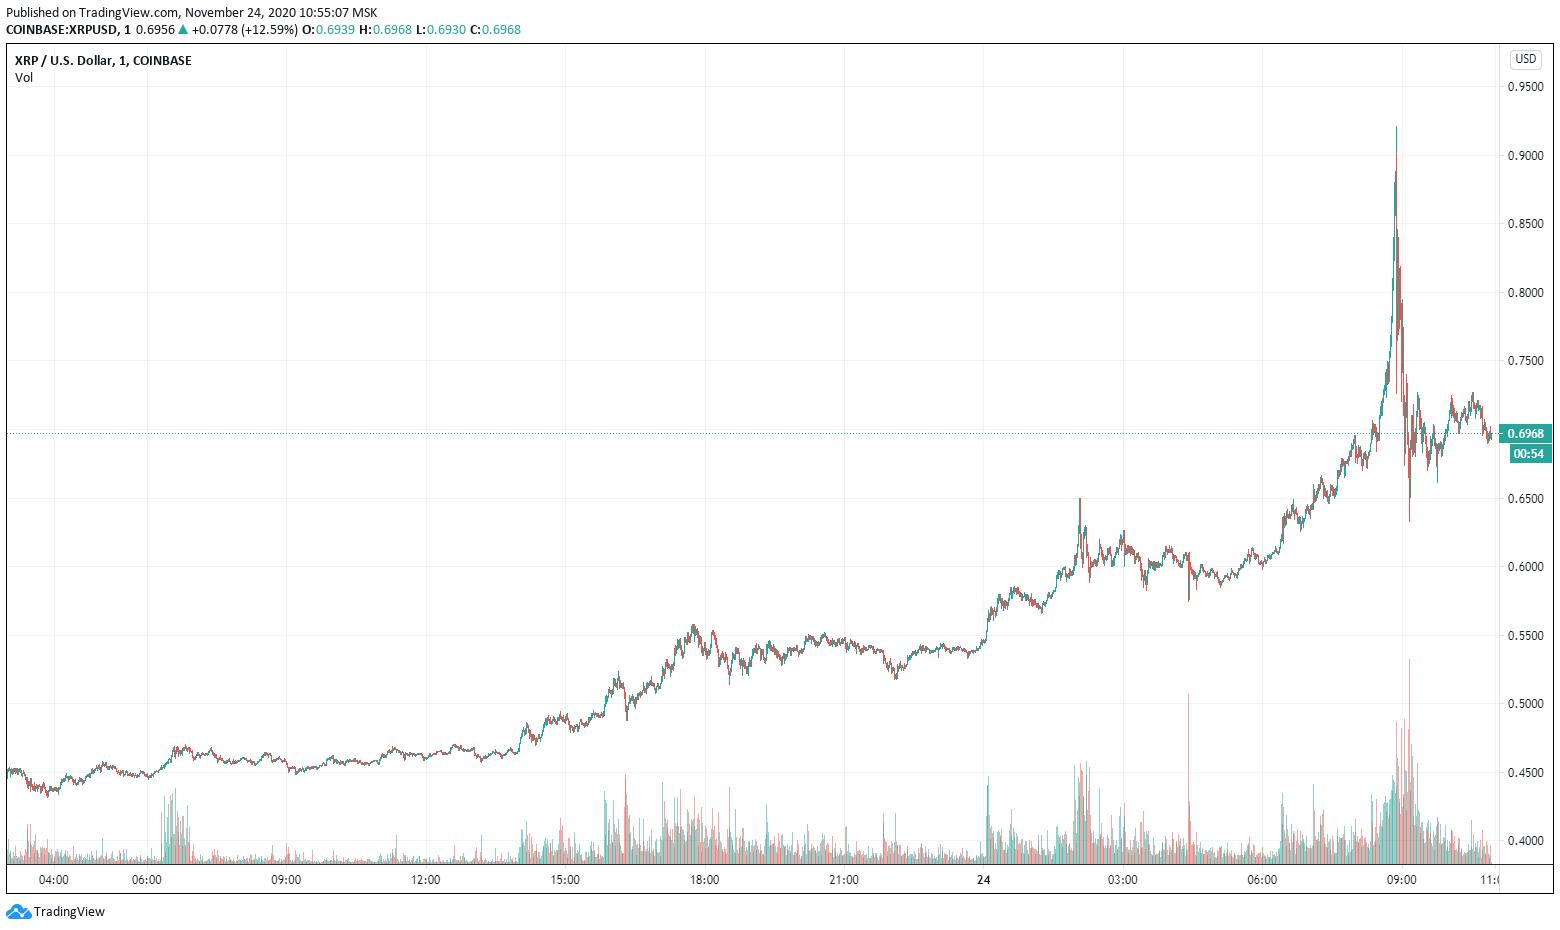 Цена XRP поднялась до двухлетнего максимума, а затем рухнула на 30%